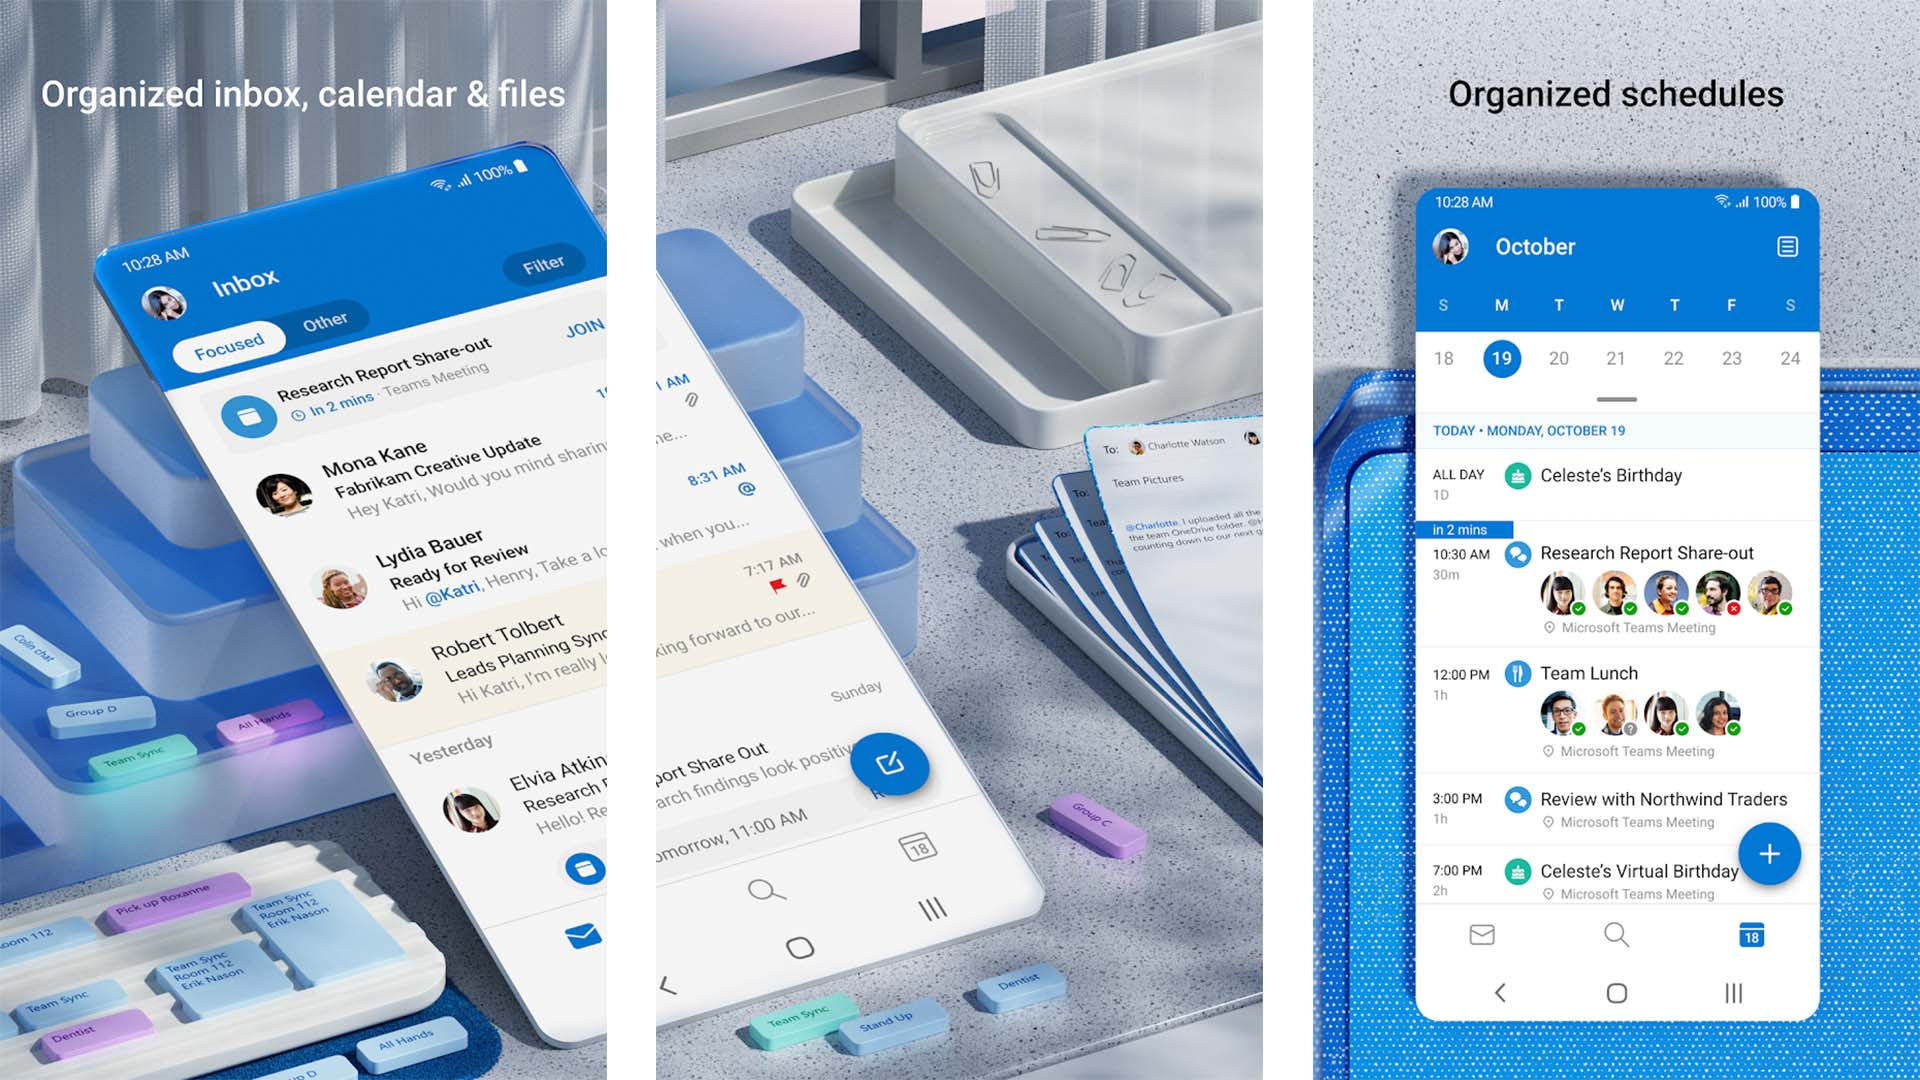 Microsoft Outlook screenshot 2021